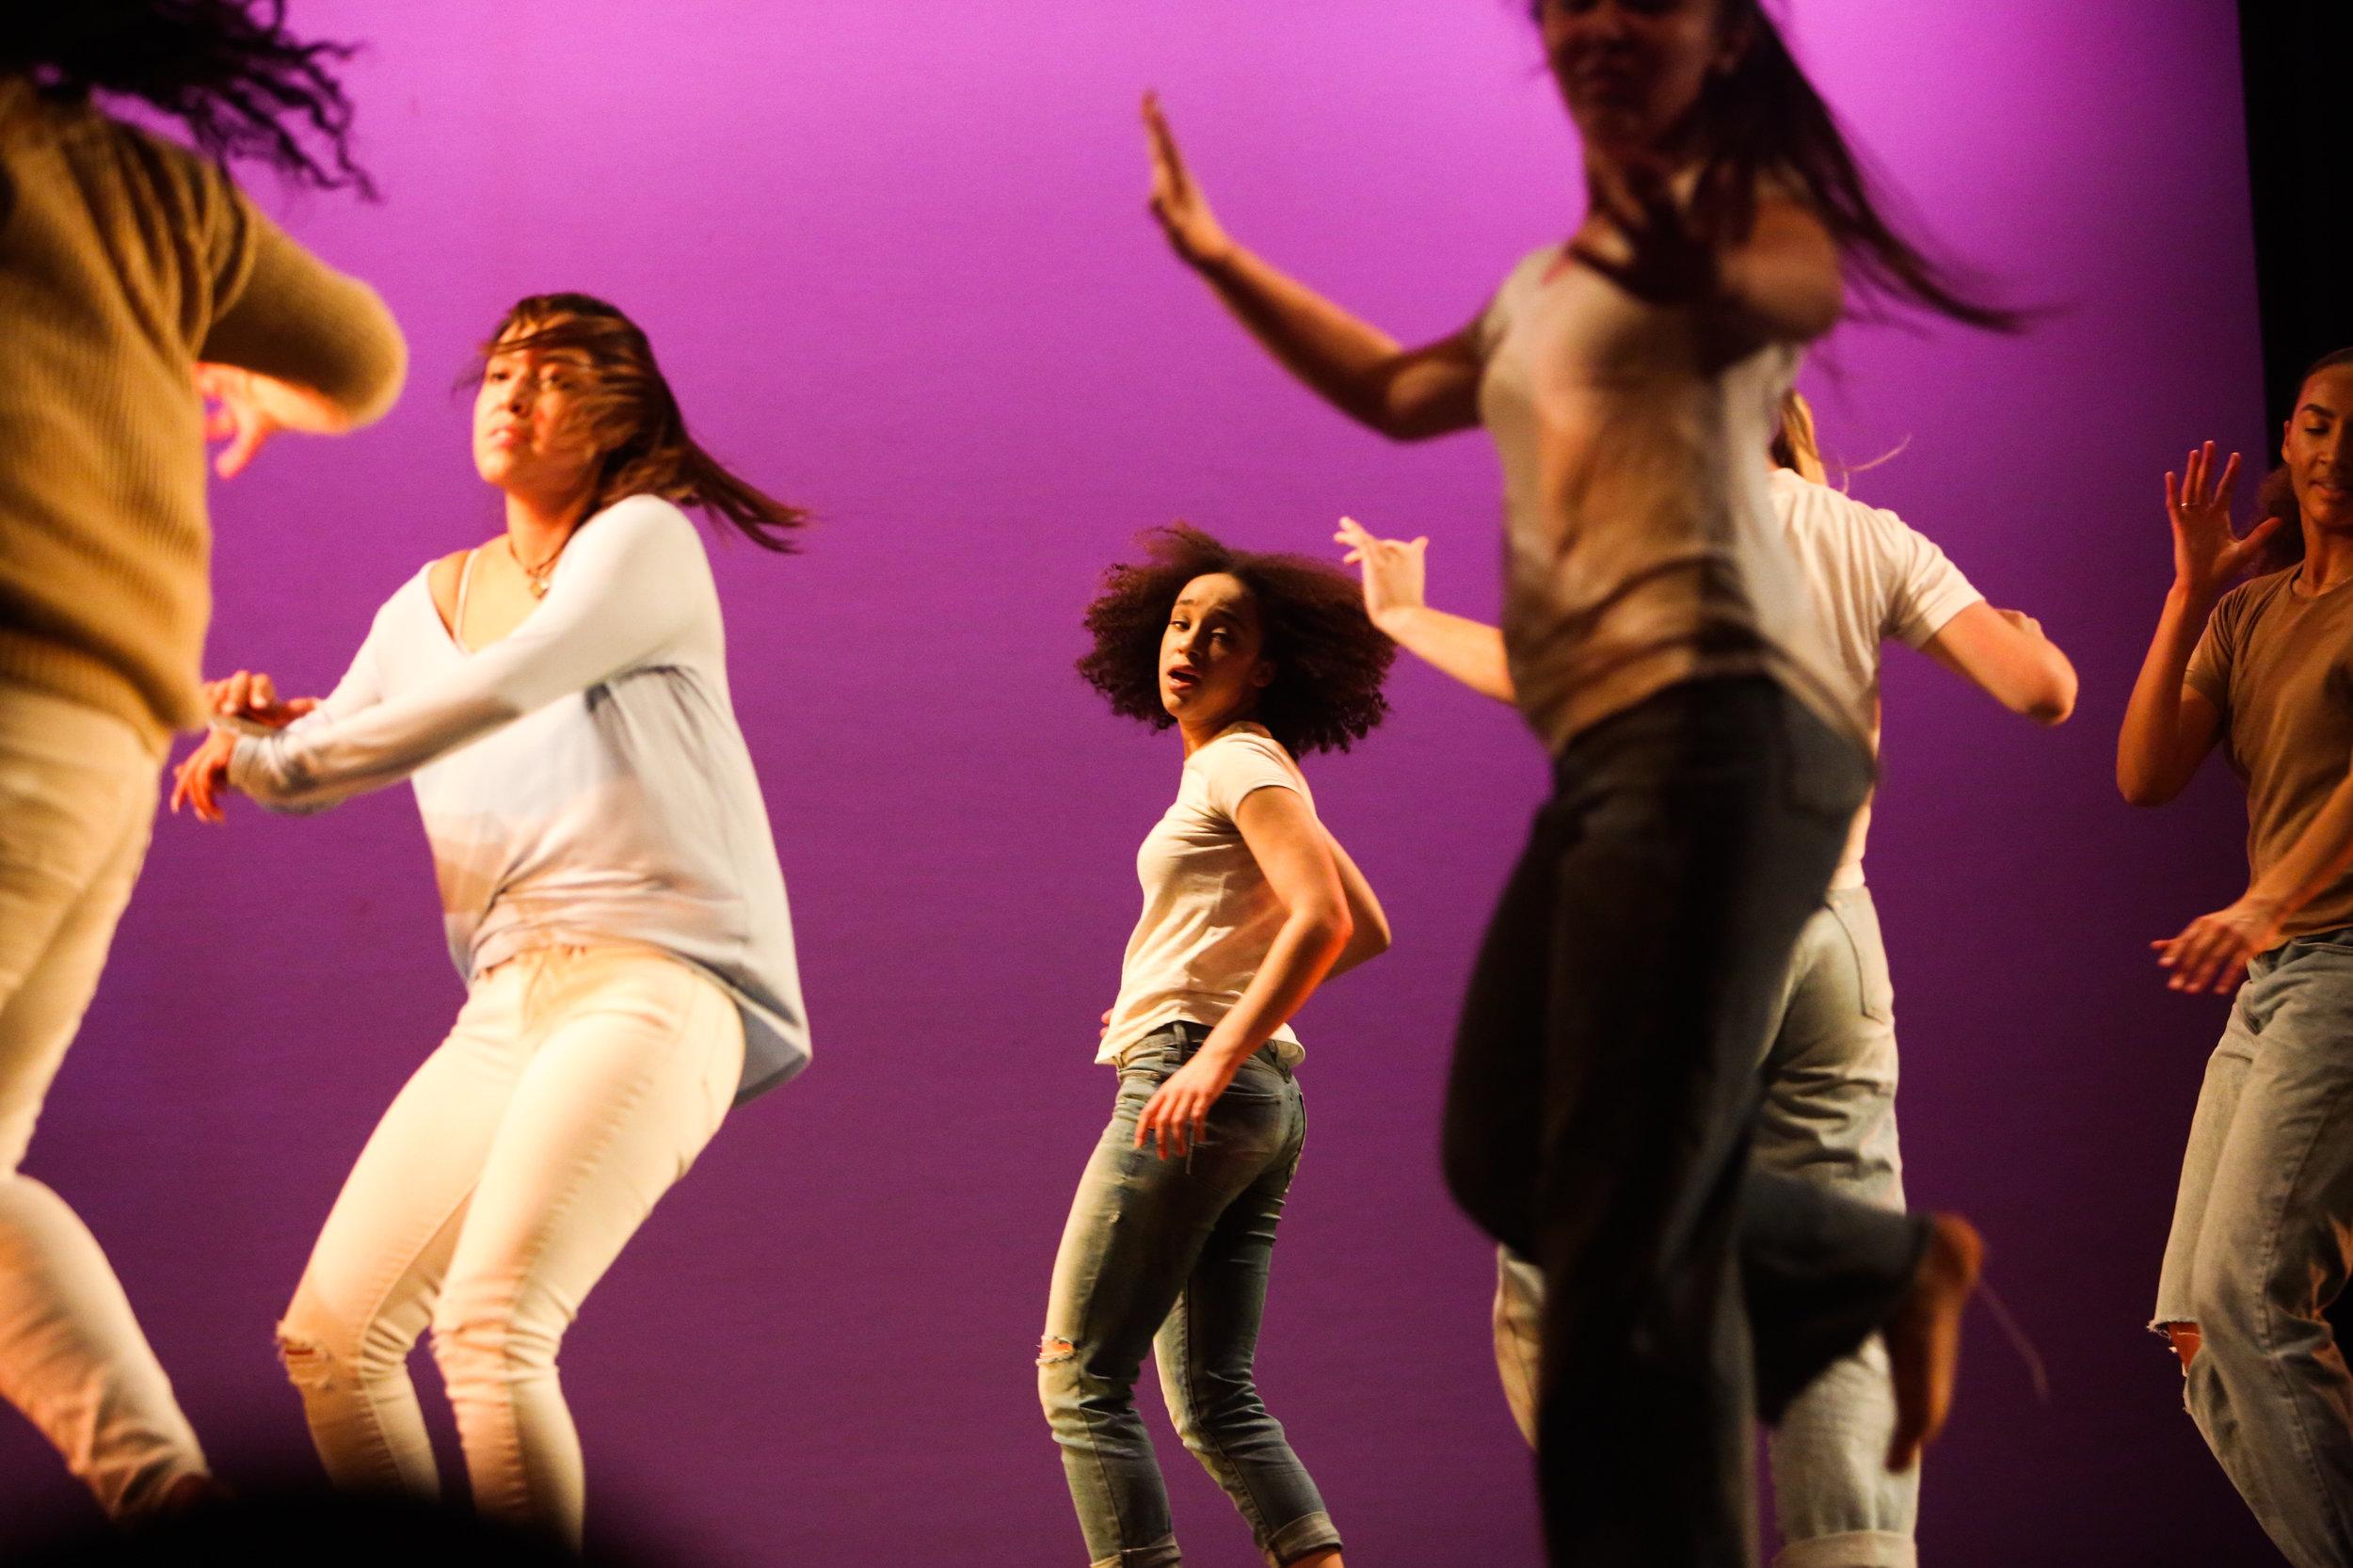 BHSdanceBHSdanceBHS dance5B0A6055002130054200068.jpg